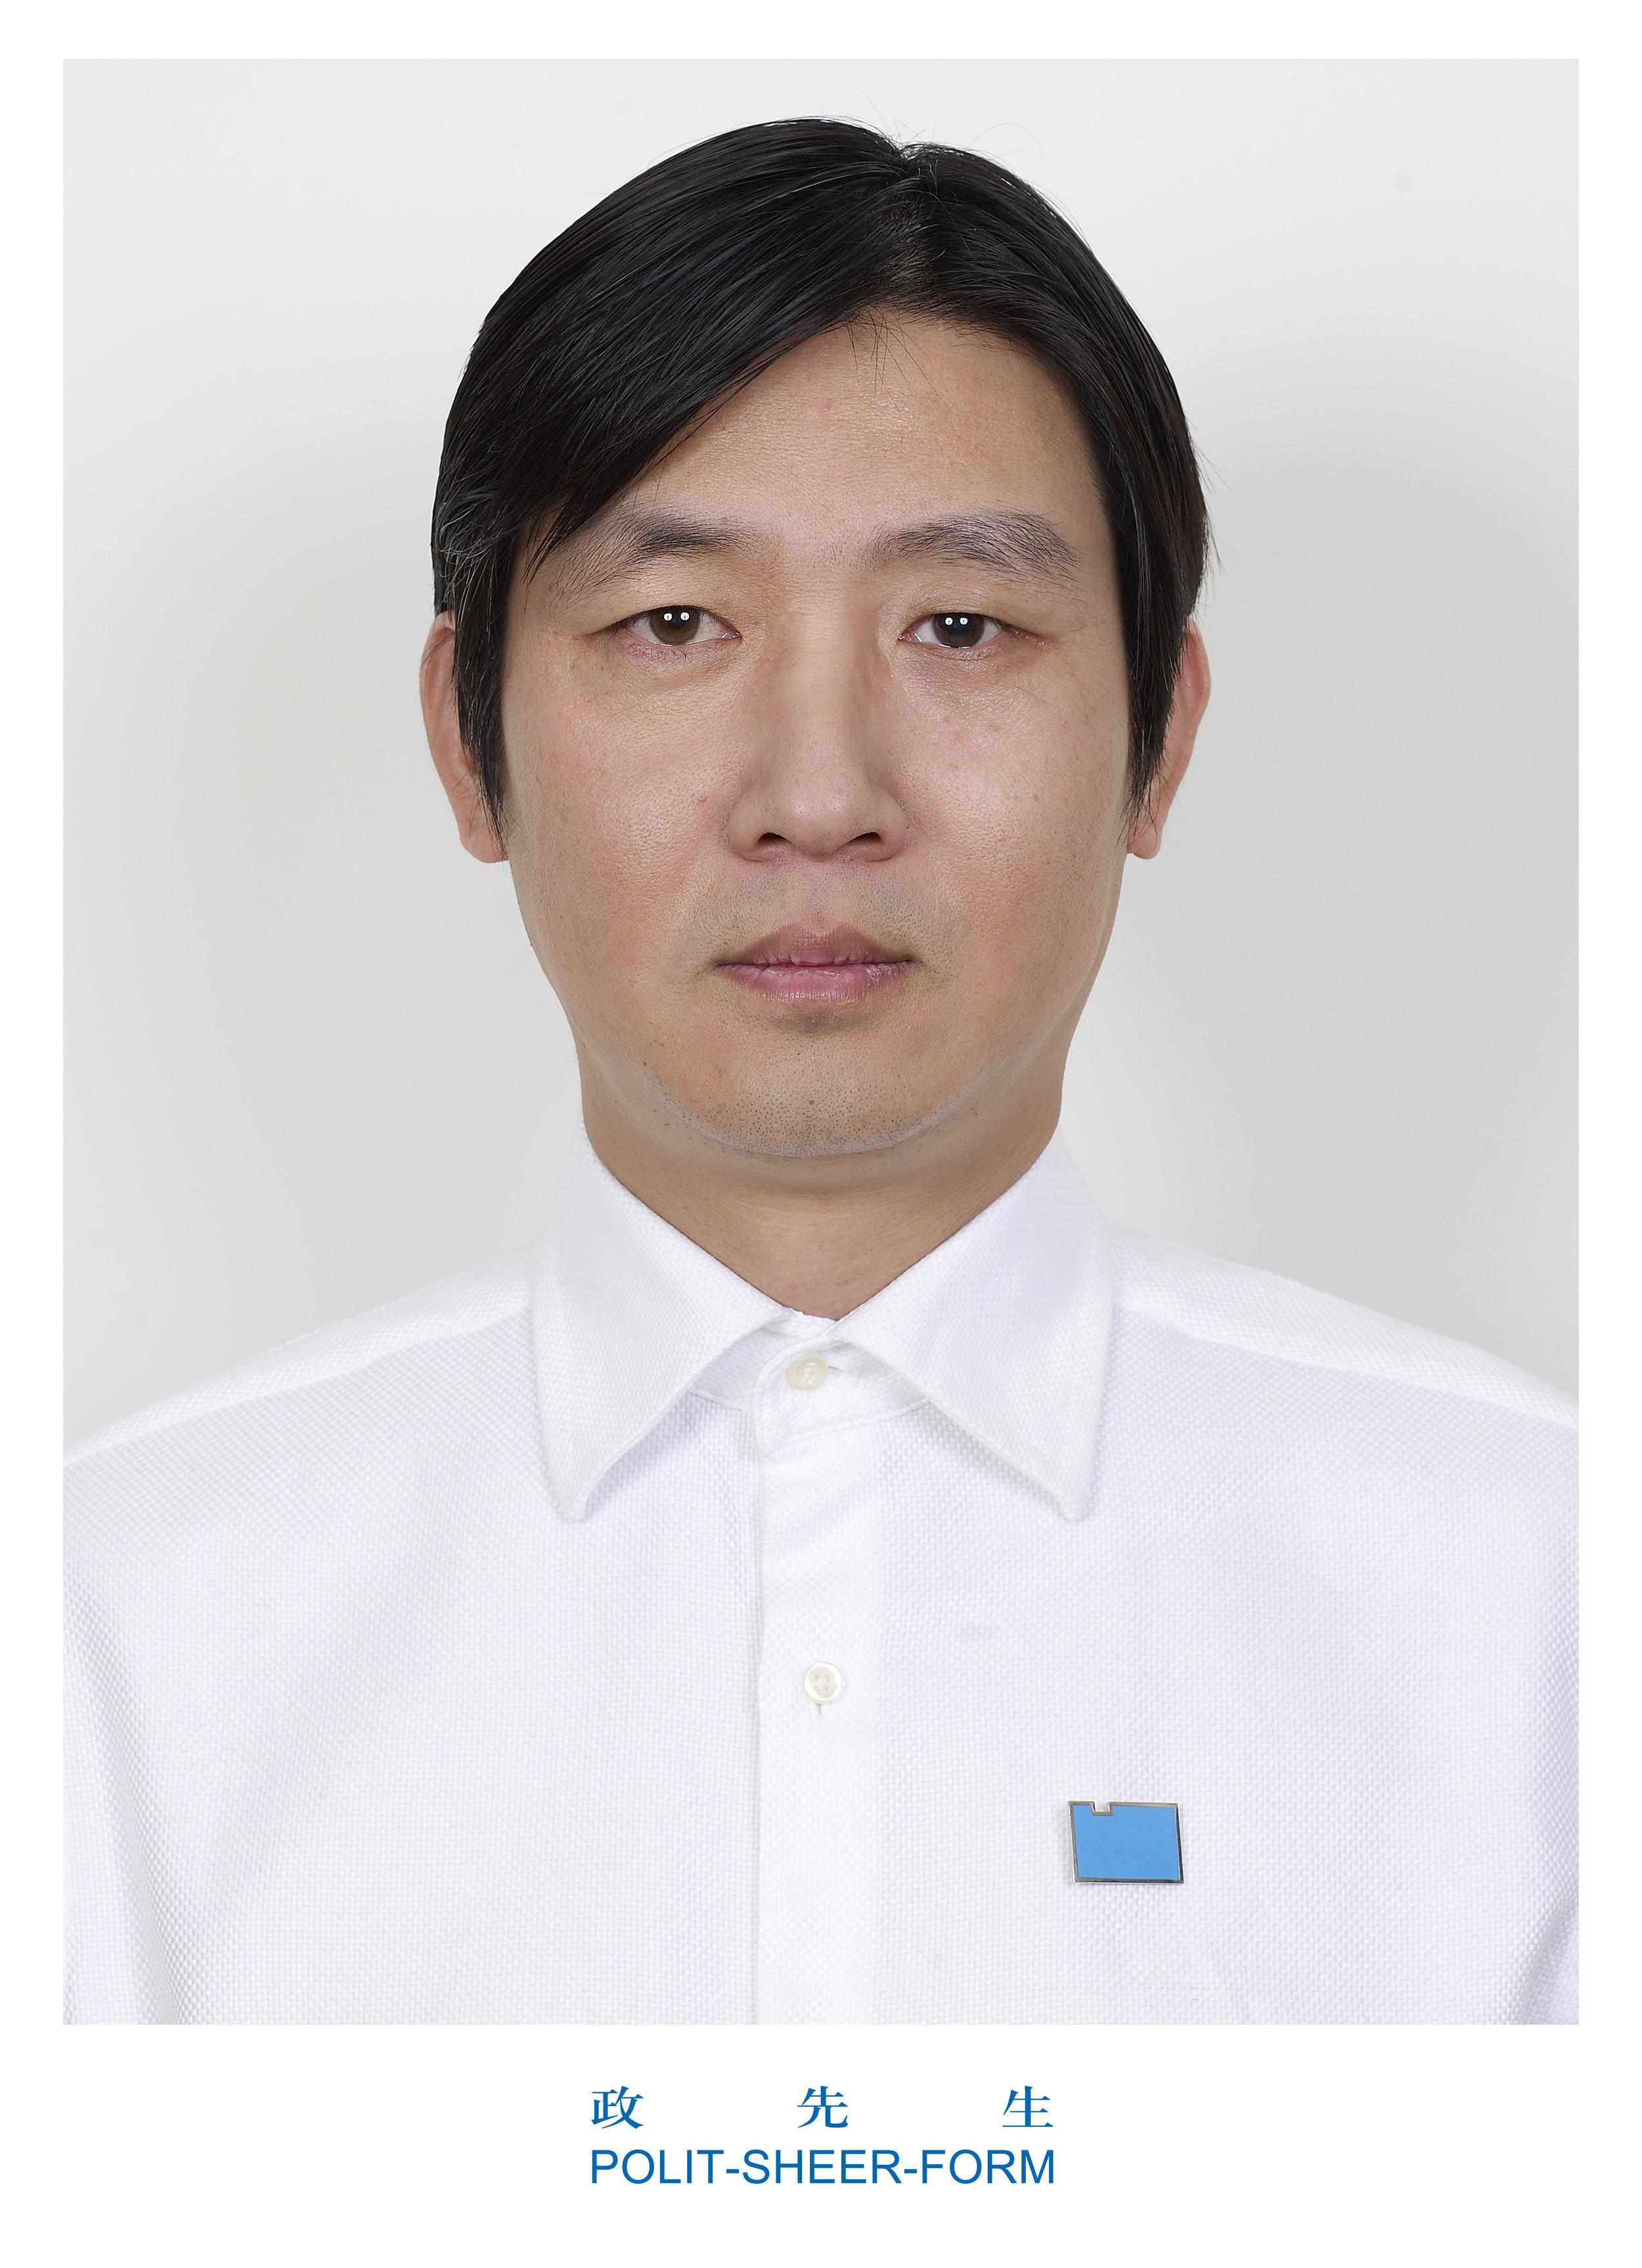 Mr Zheng  - Polit-Sheer-Form Office (PSFO)